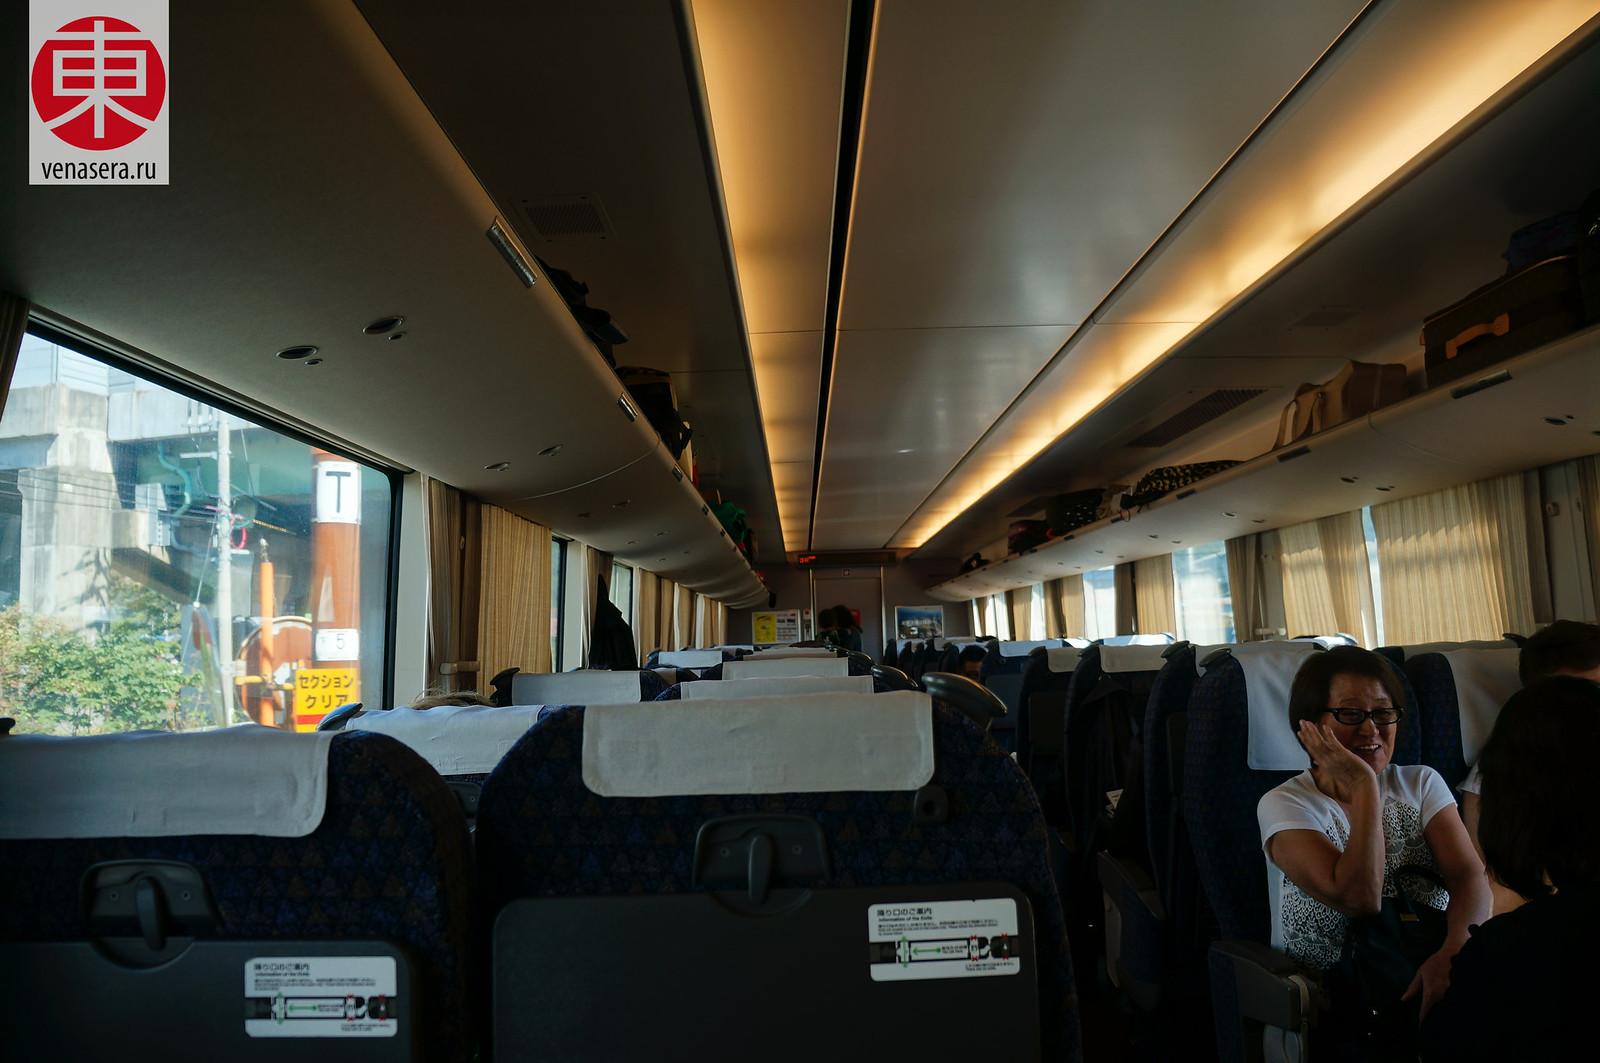 Поезд Thunderbird (サンダーバード), который курсирует по маршруту Осака - Тояма.